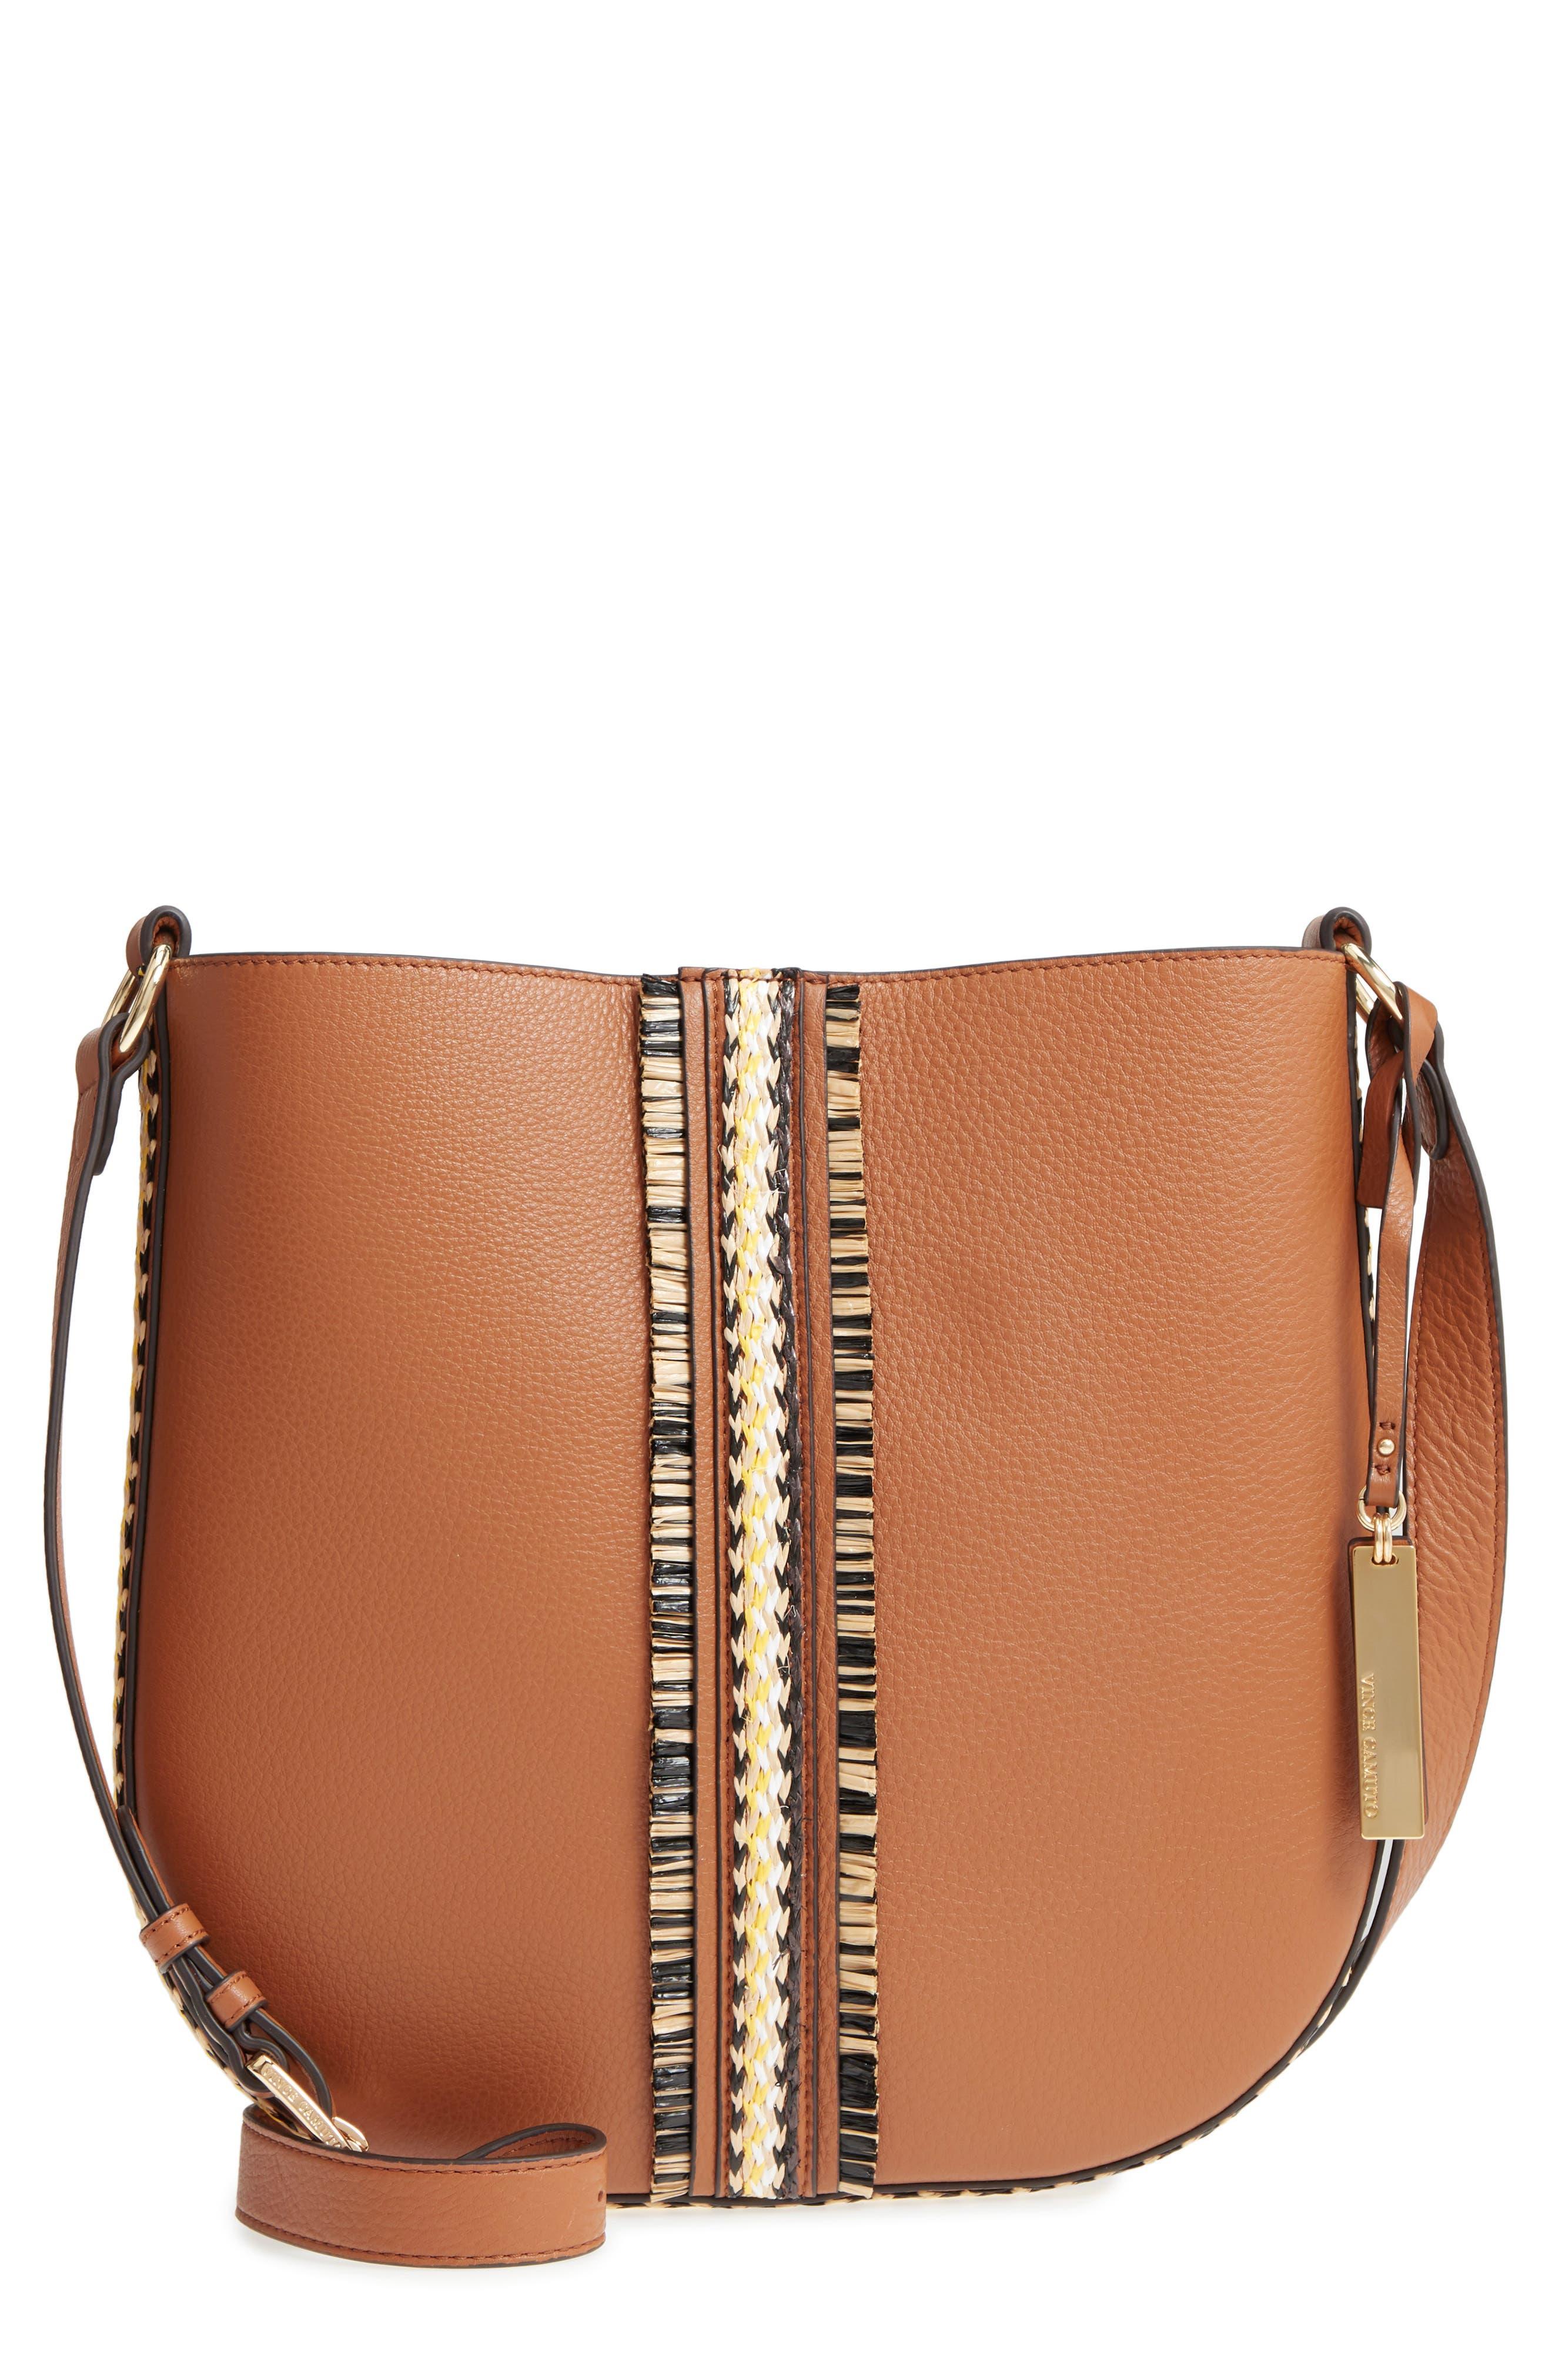 Crossbody Bag,                             Main thumbnail 1, color,                             Spiced Brown